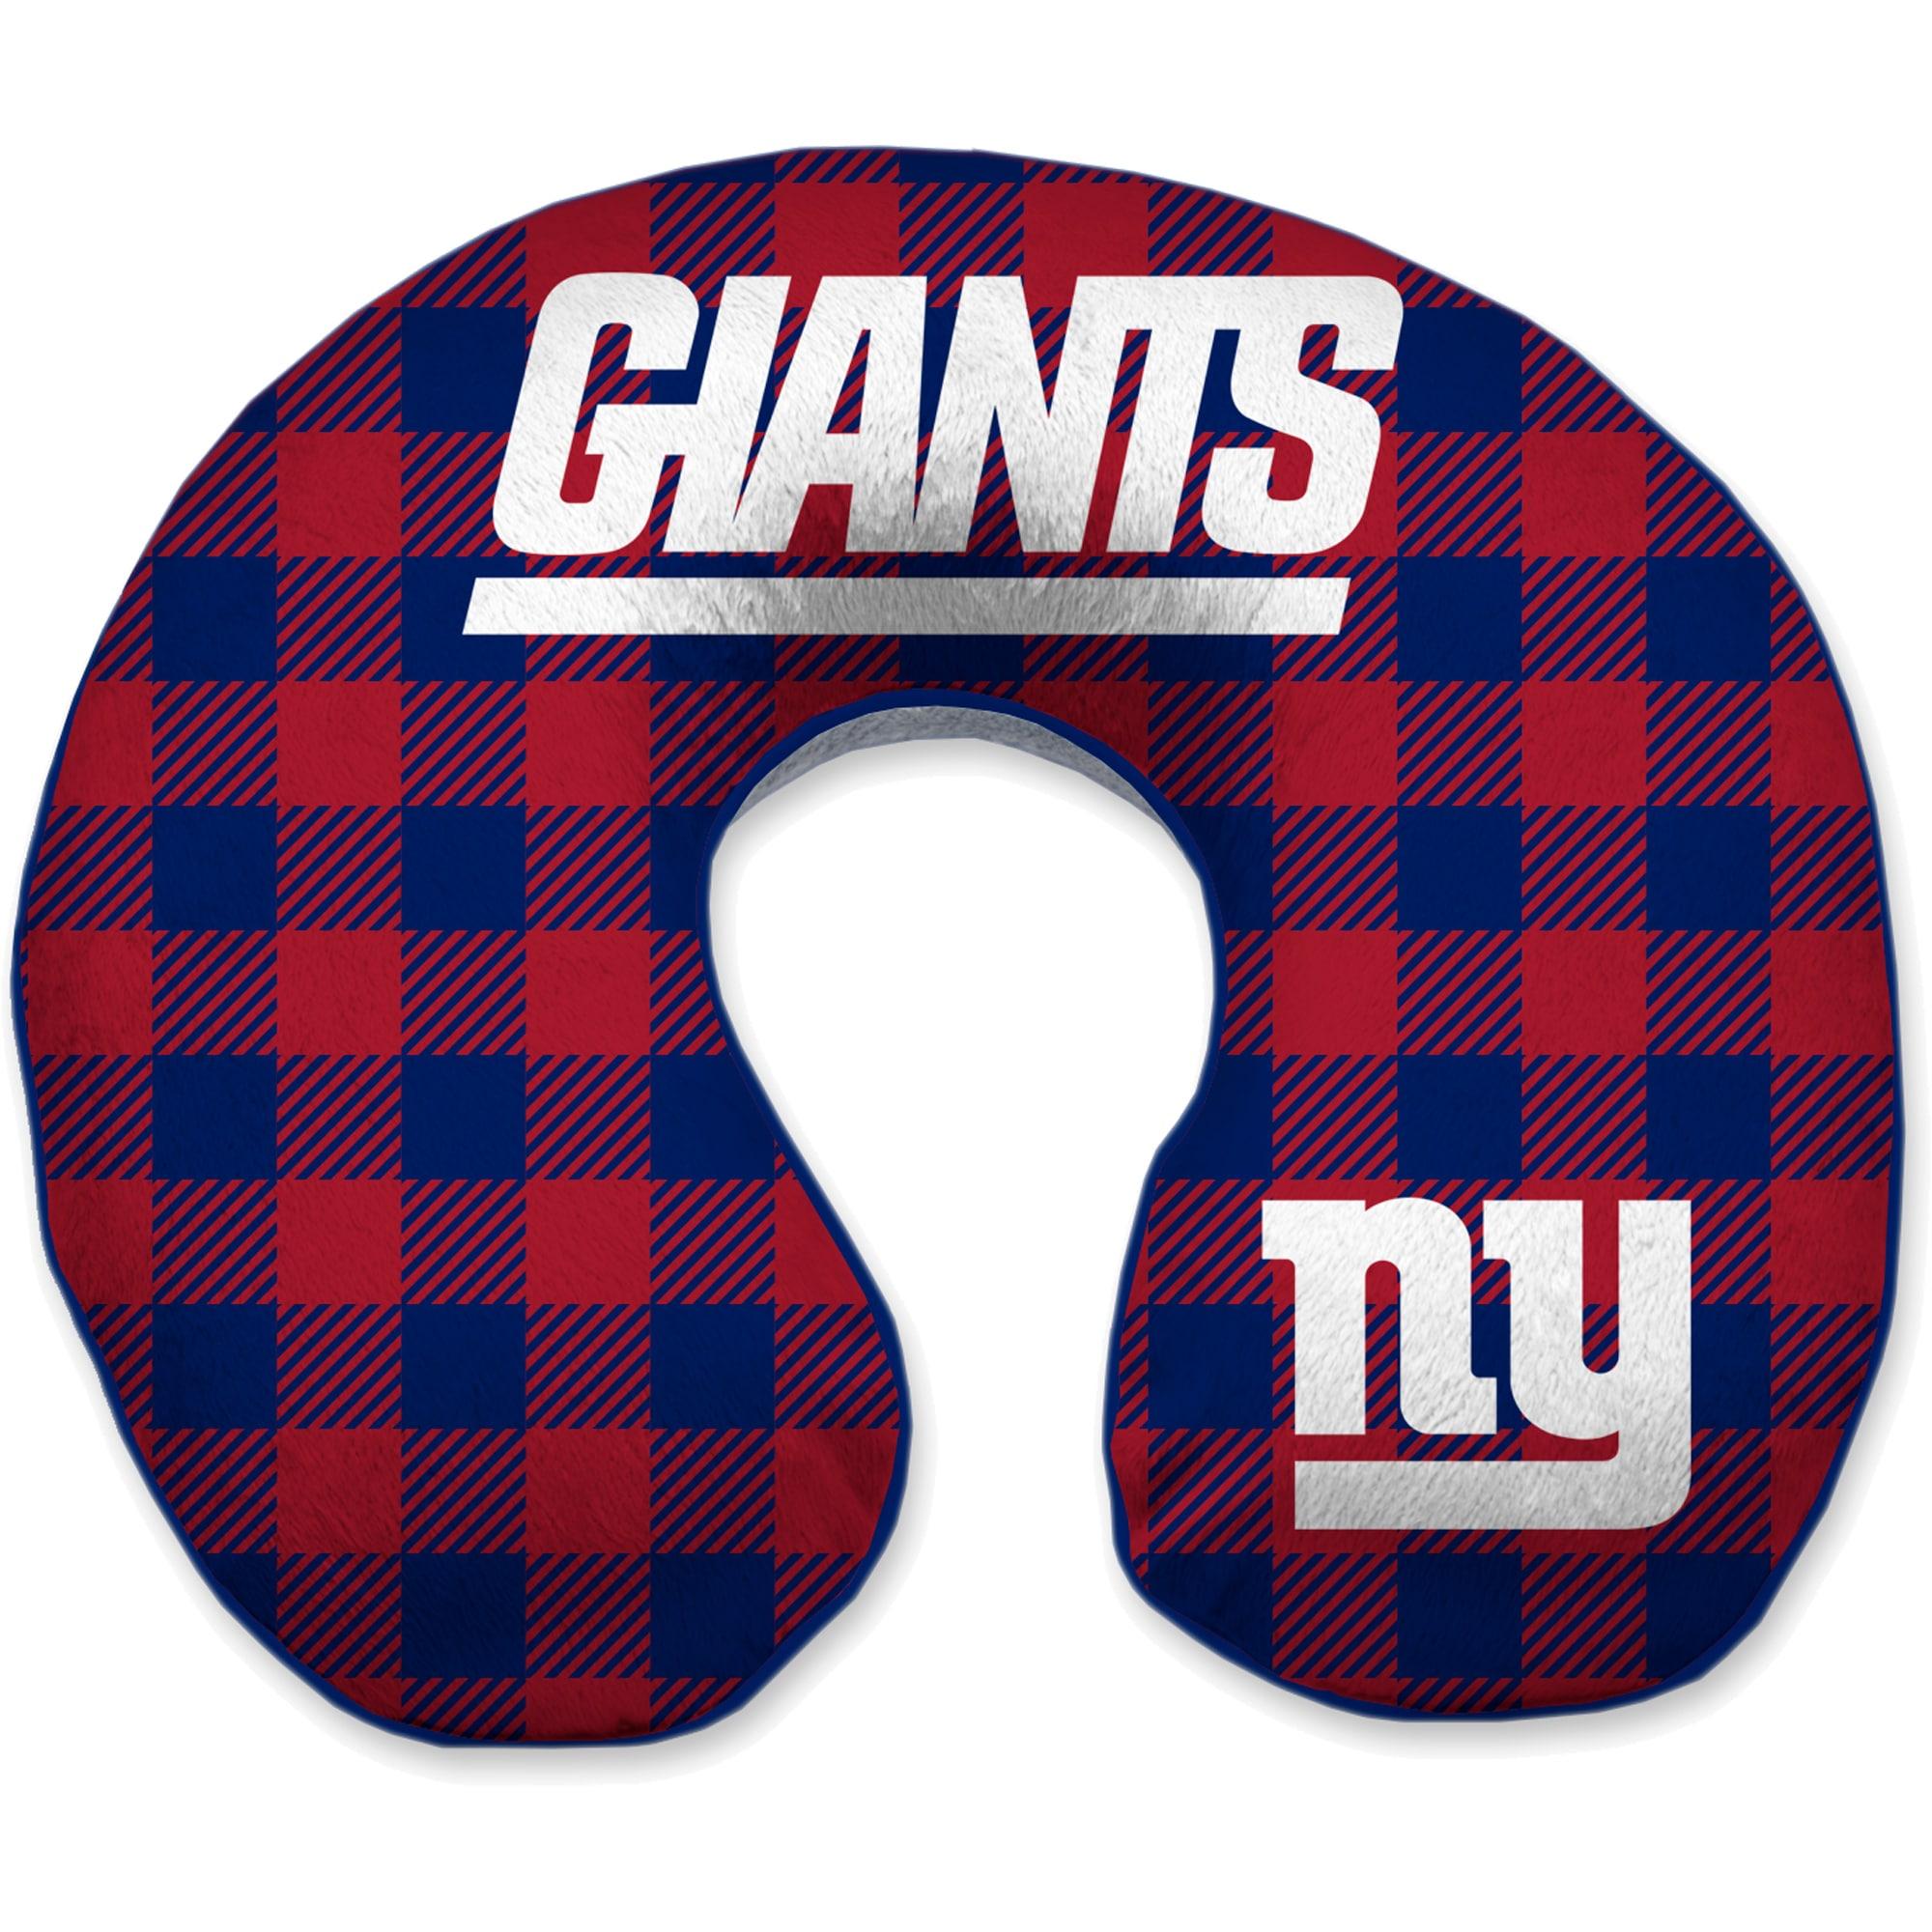 New York Giants Buffalo Check Sherpa Memory Foam Travel Pillow - Blue